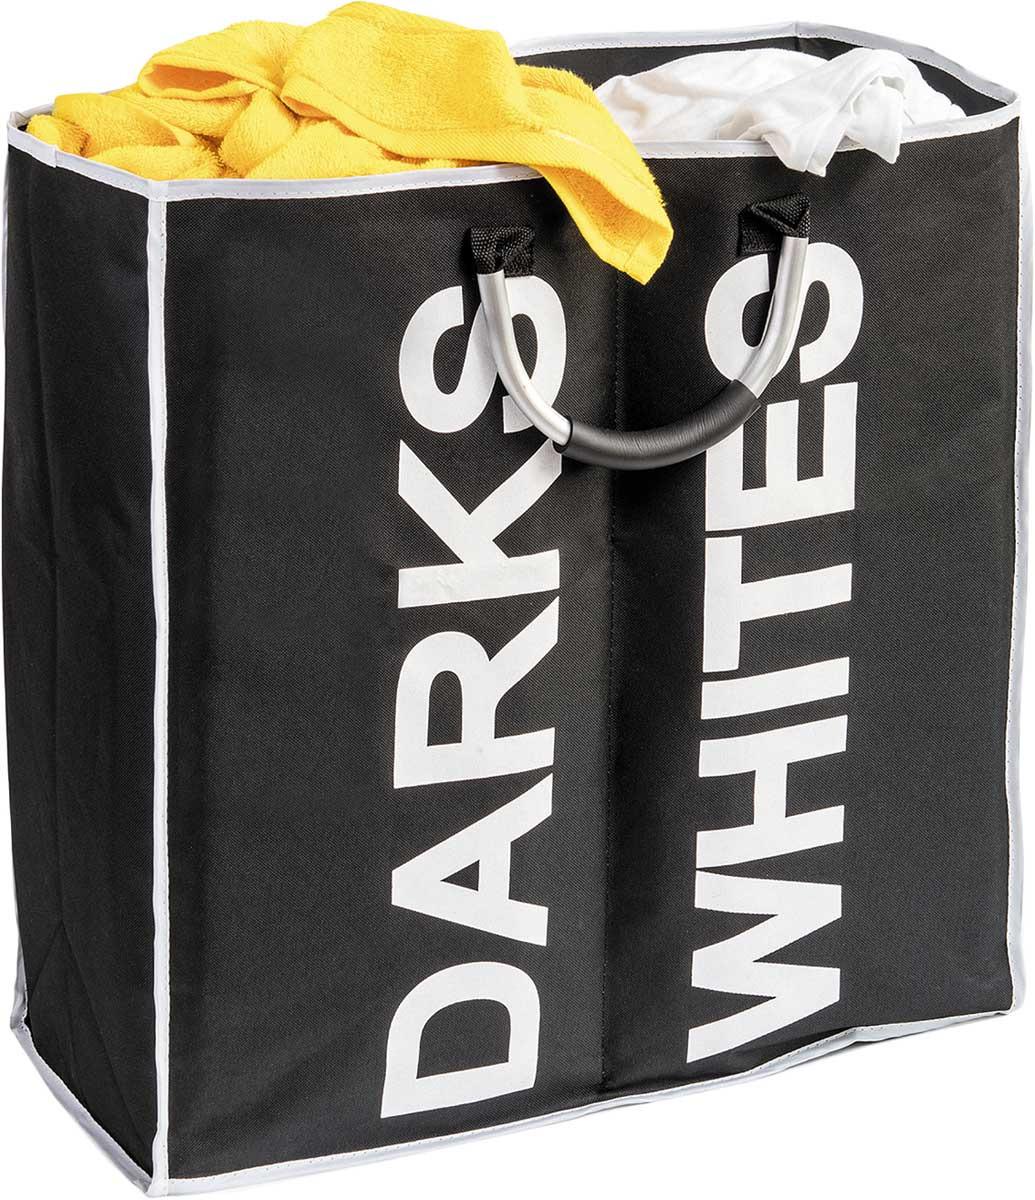 Корзина для белья Tatkraft Spase с разделителем, цвет: черный, белый, 53,5 х 52,5 х 22 см корзина подвесная tatkraft on двухуровневая 25 х 12 х 47 см